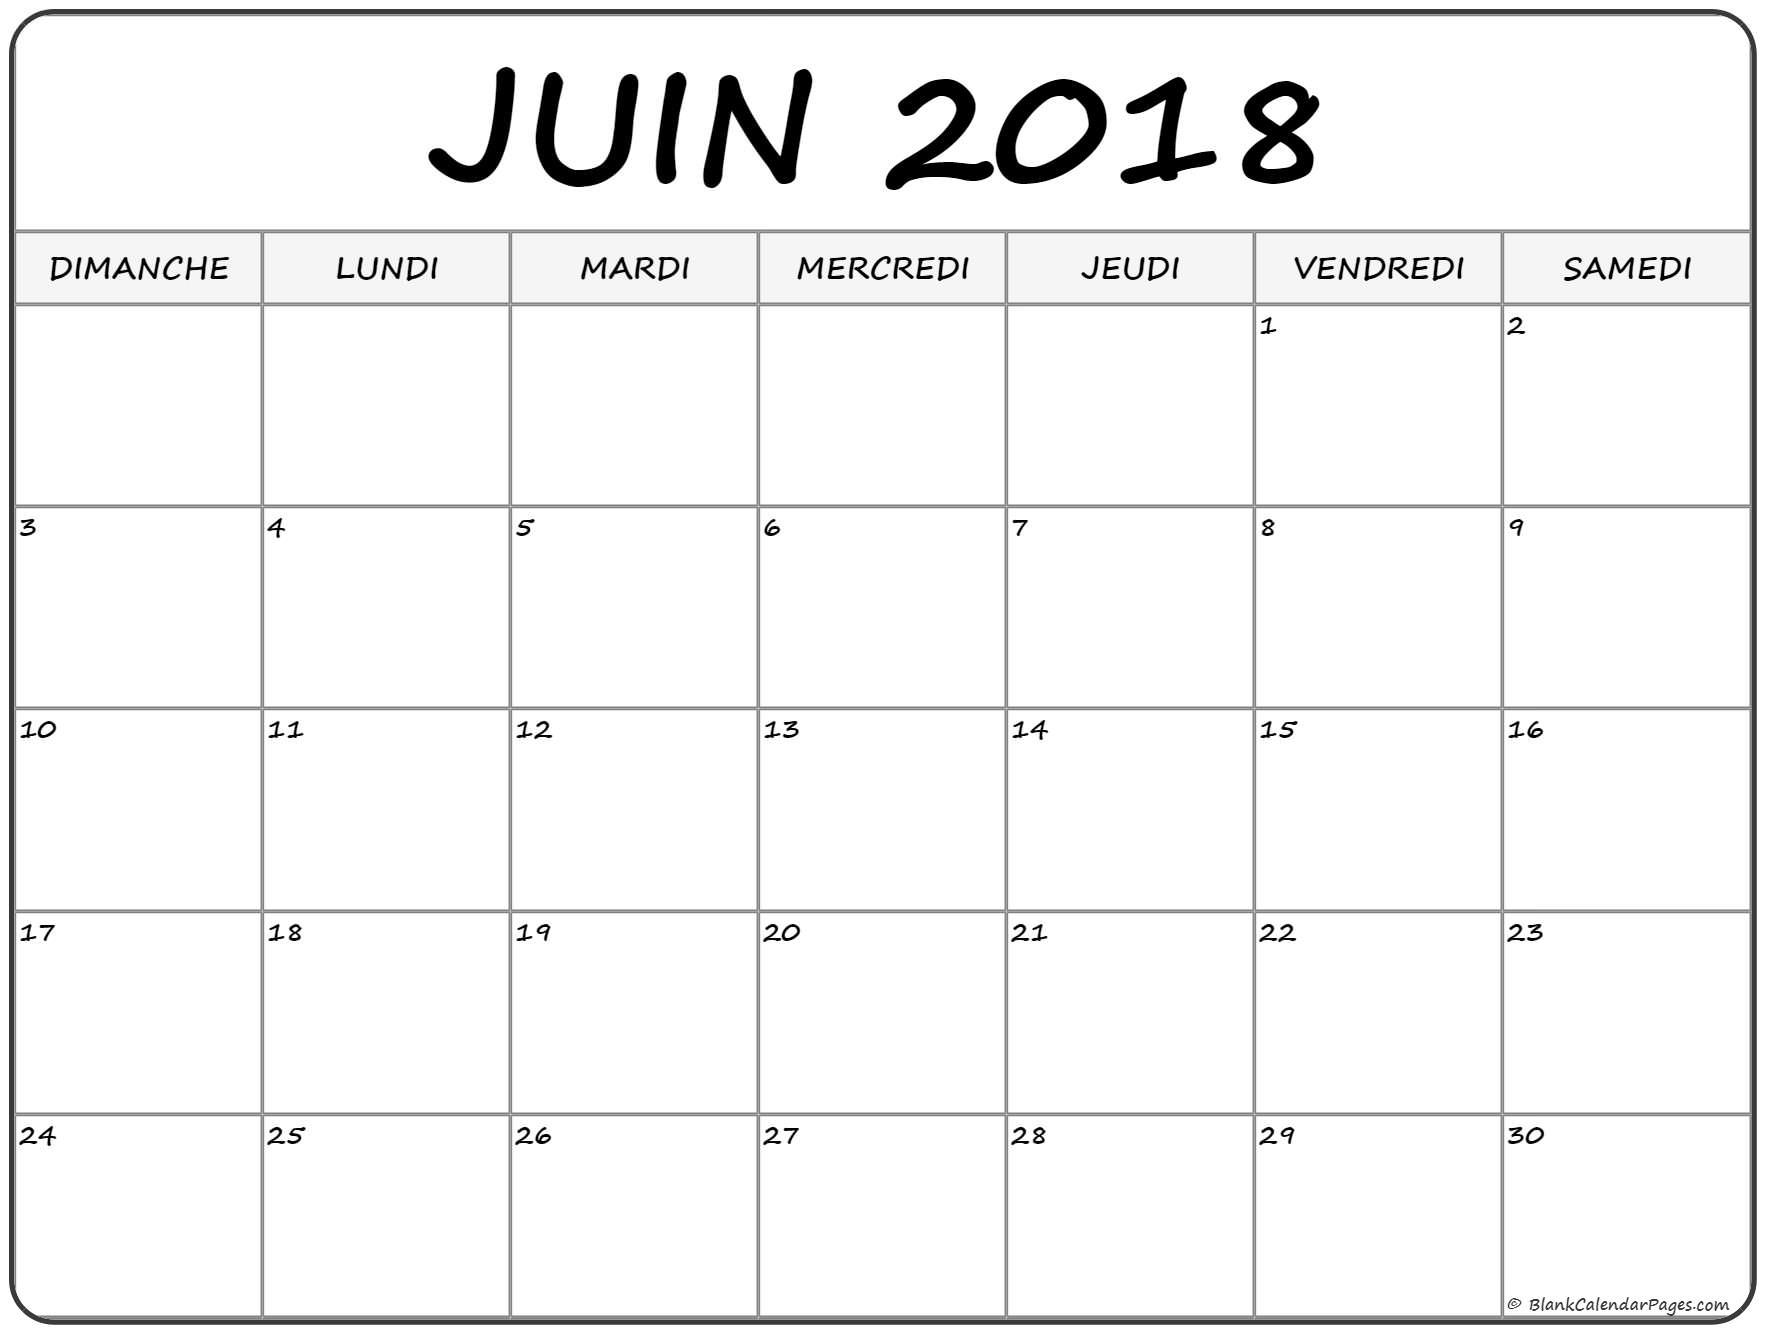 juin #2018 #calendrier #gratuit | Monthly calendar printable